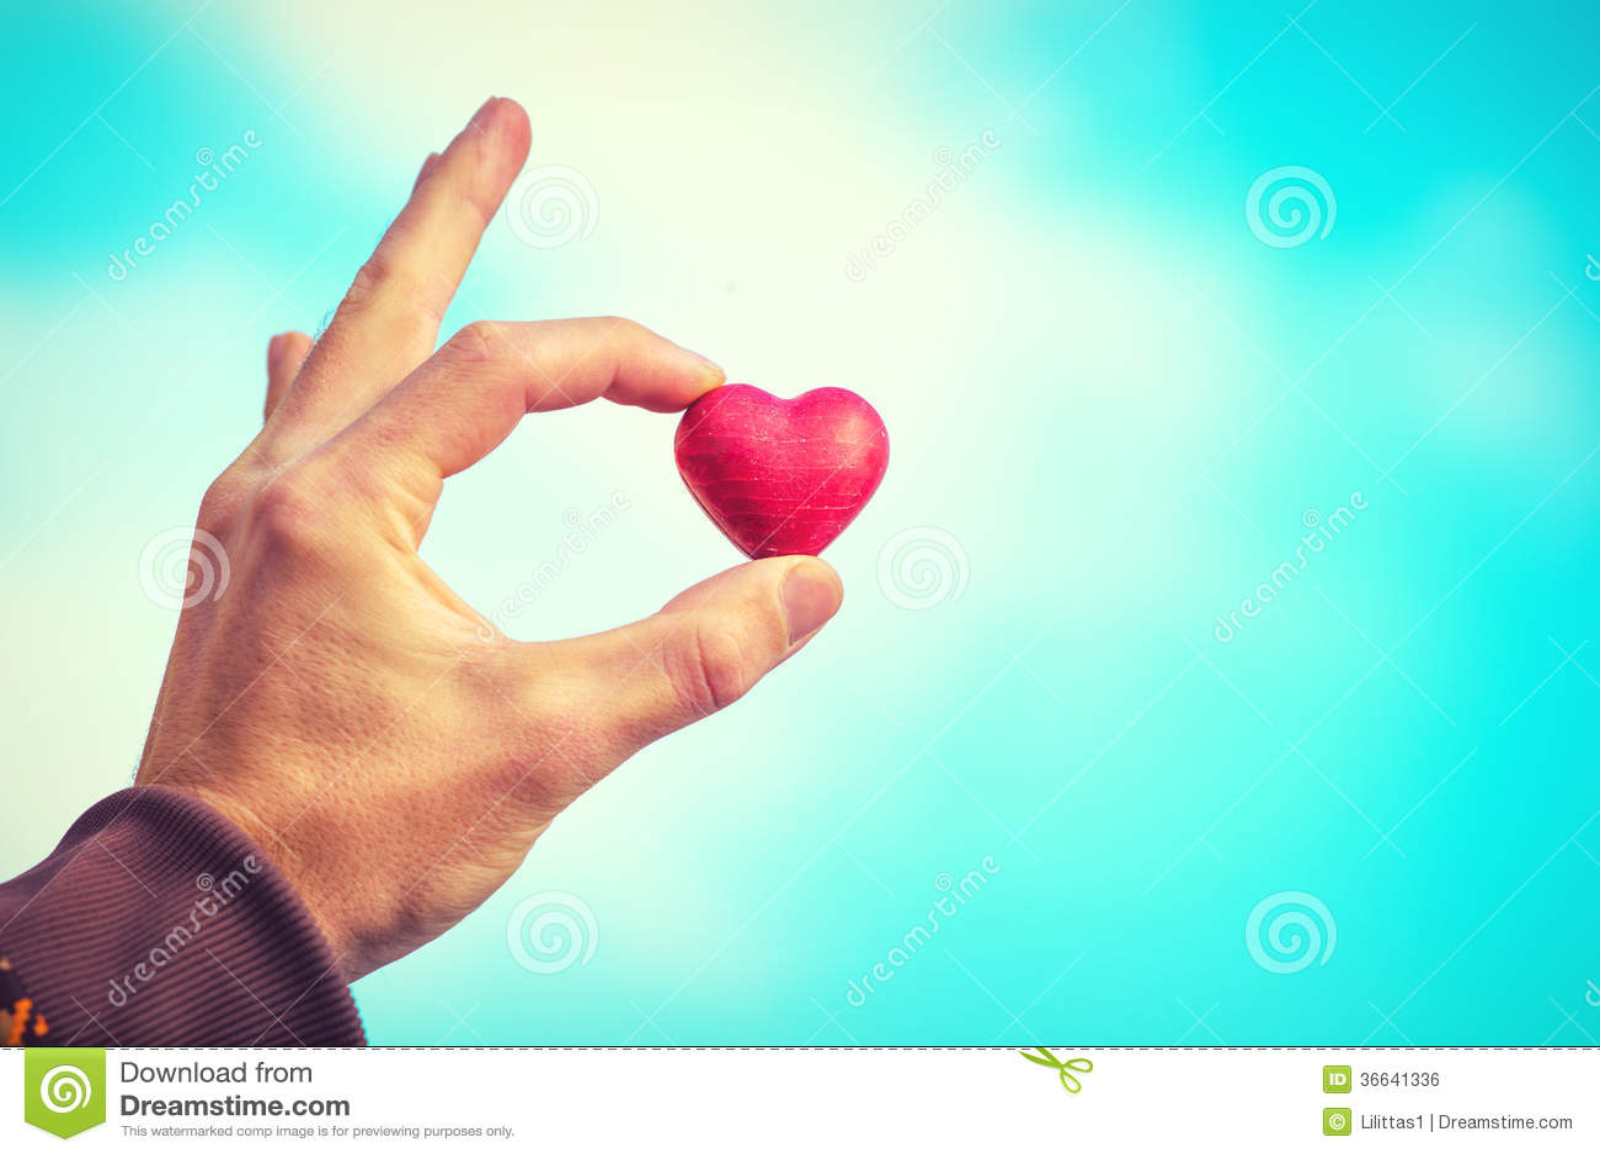 Heart shape love symbol in man hand valentines day holiday stock heart shape love symbol in man hand valentines day holiday biocorpaavc